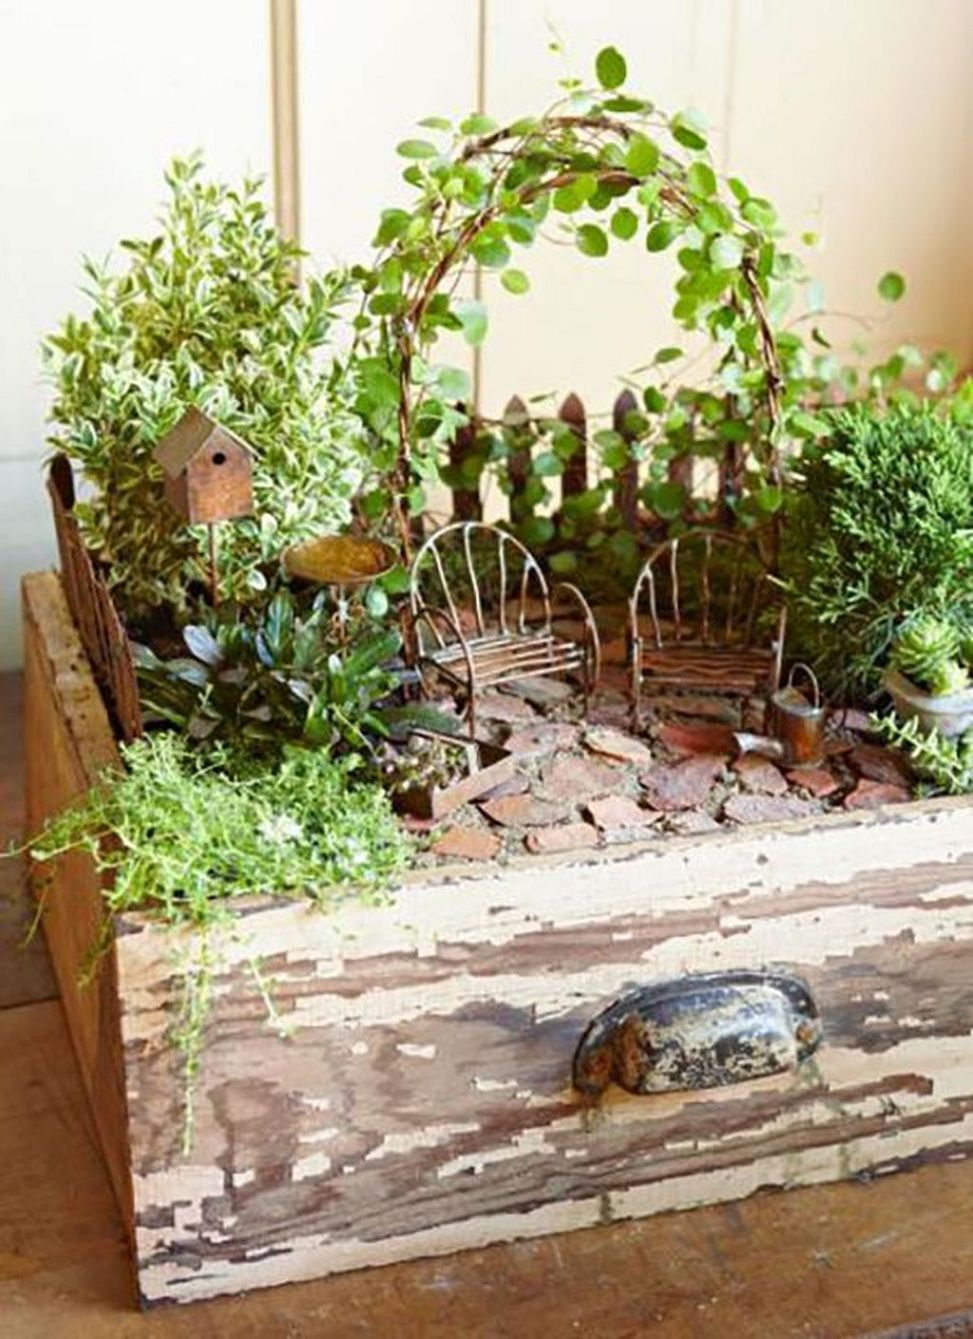 Enticing Create Fairy Garden Ideas Create Fairy Garden Ideas Garden Fairy Gardens Fairy Garden Ideas garden Cute Fairy Garden Ideas